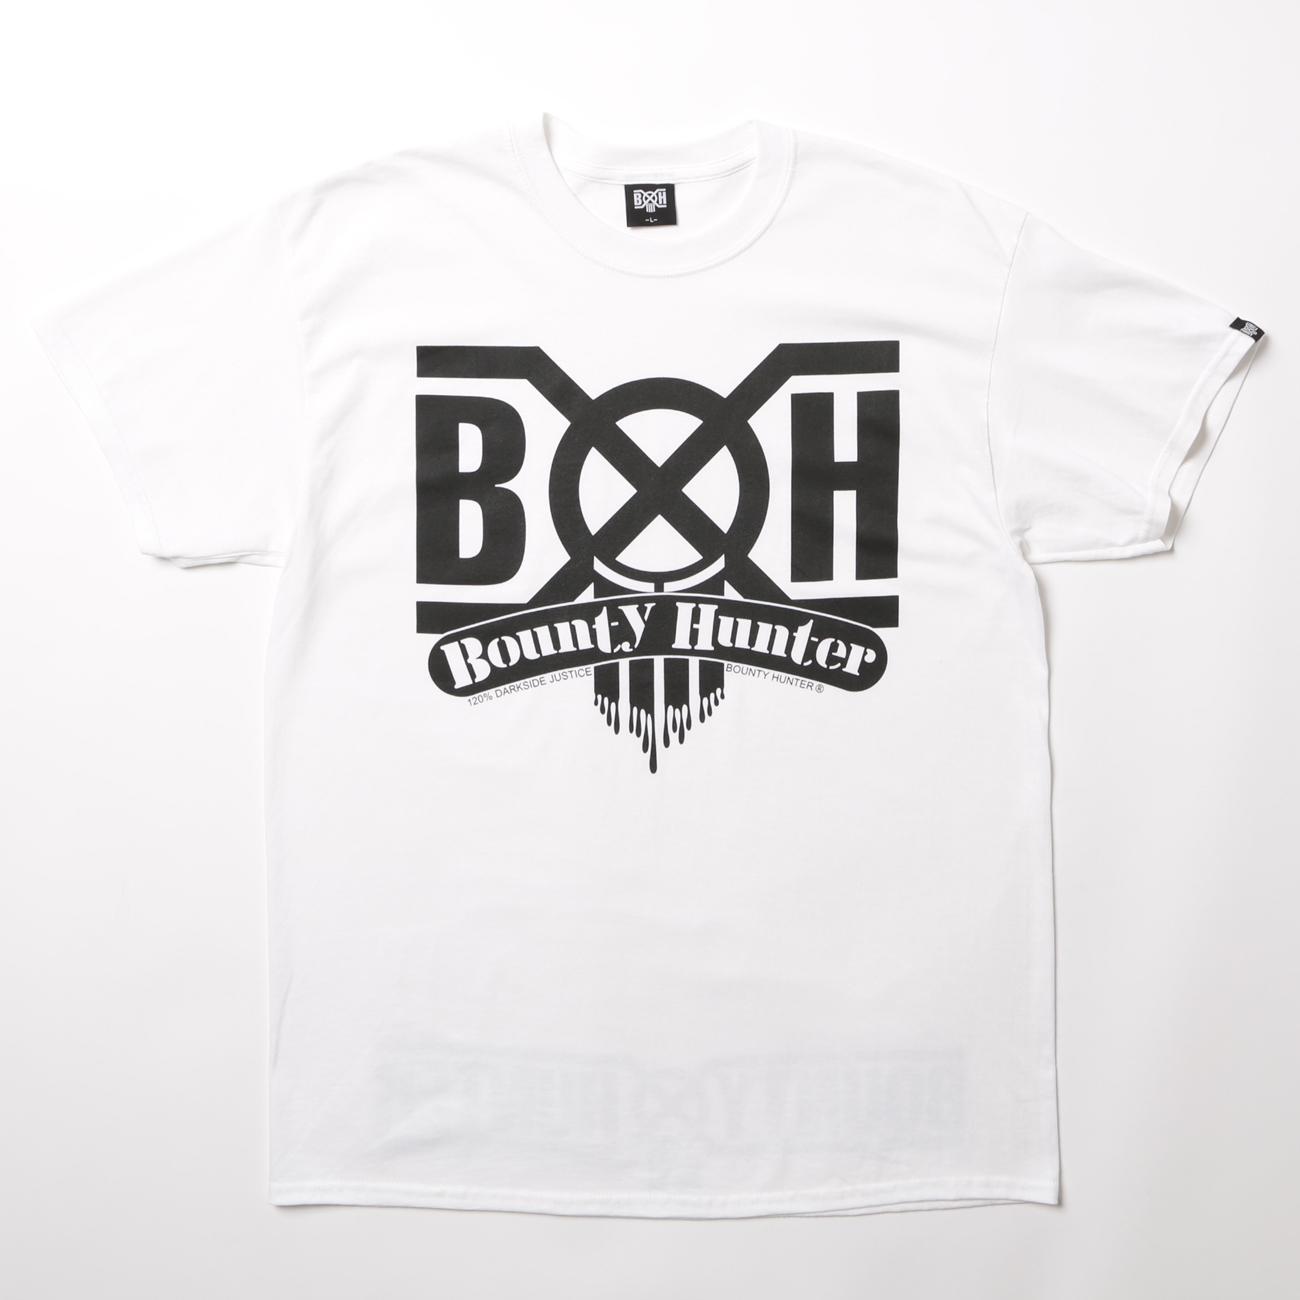 BxH 2020 FALL & WINTER_b0132106_12491773.jpg